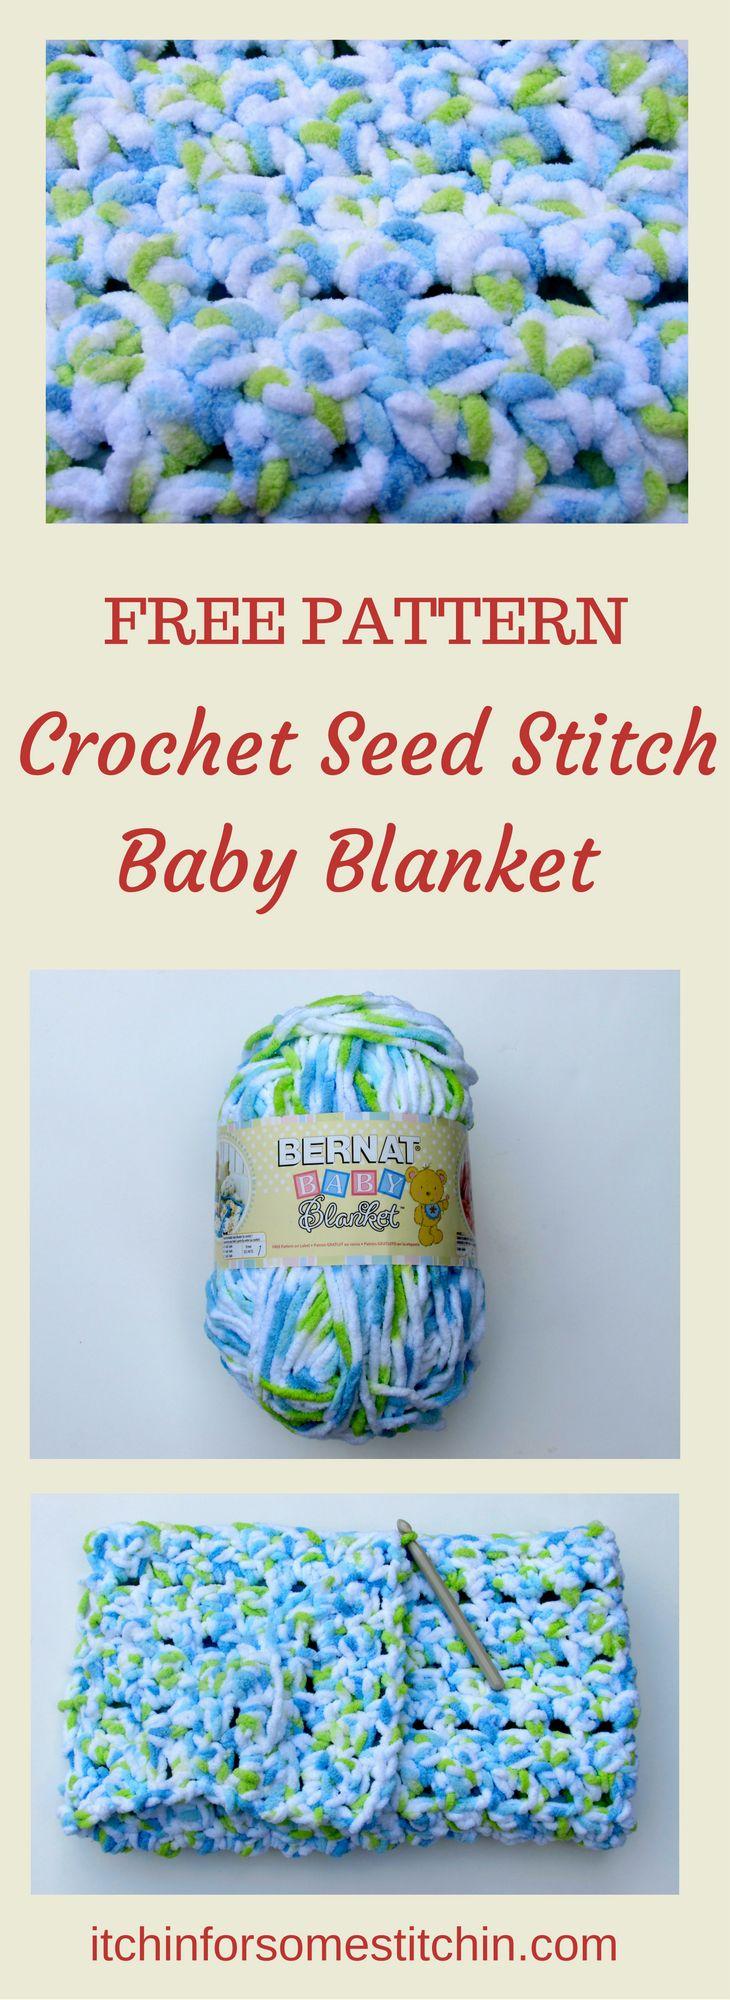 25+ Best Ideas About Baby Blanket Patterns On Pinterest